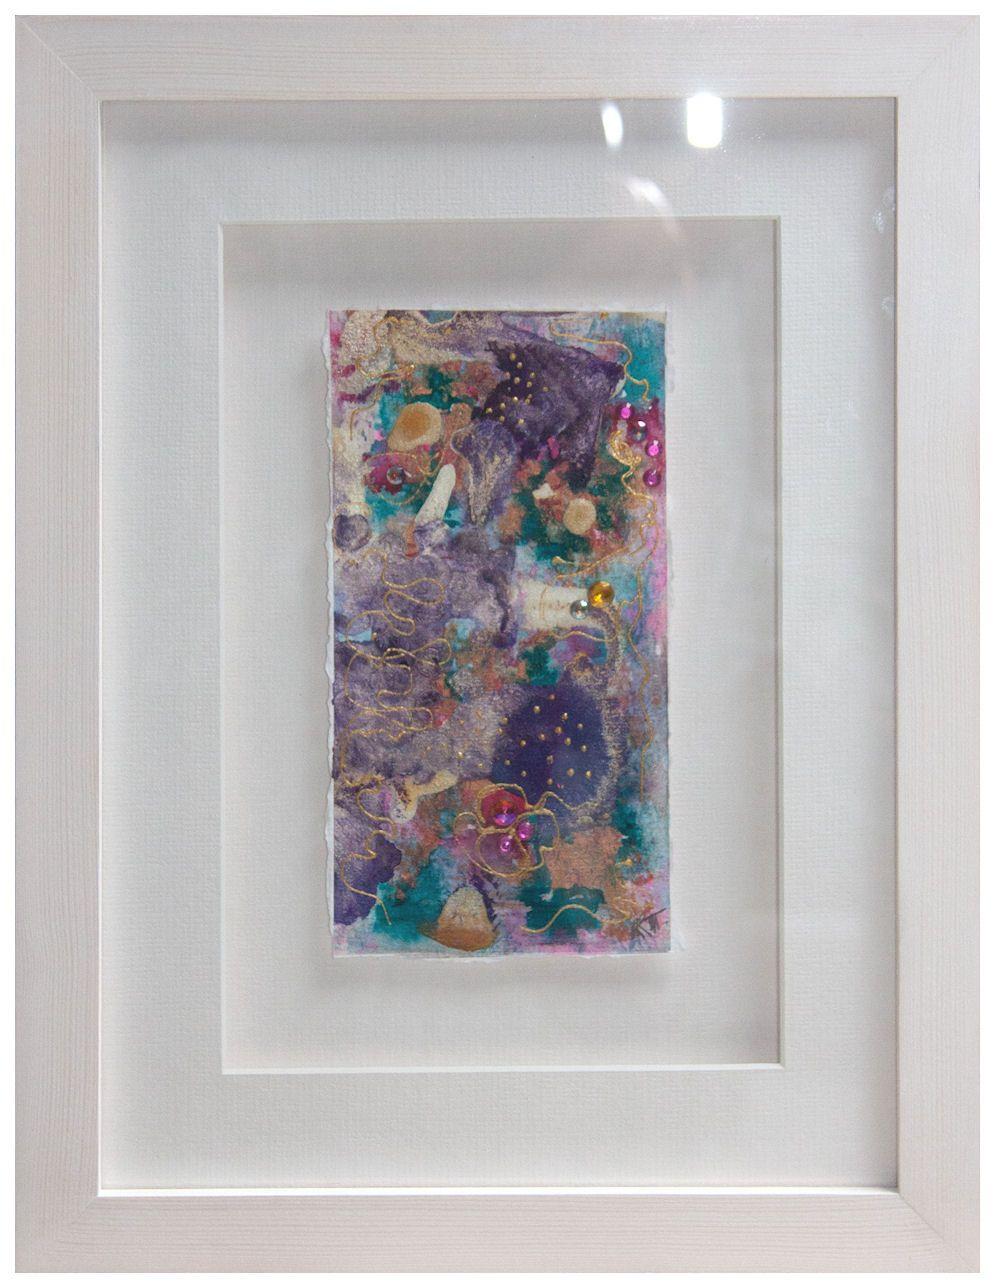 Welches Image Hat FLOAT MOUNT? | Bewertungen, Nachrichten, Such Trends |  Erfahrungsberichte. Canvas FrameTravel KitsAcrylic PaintingsWatercolor ...